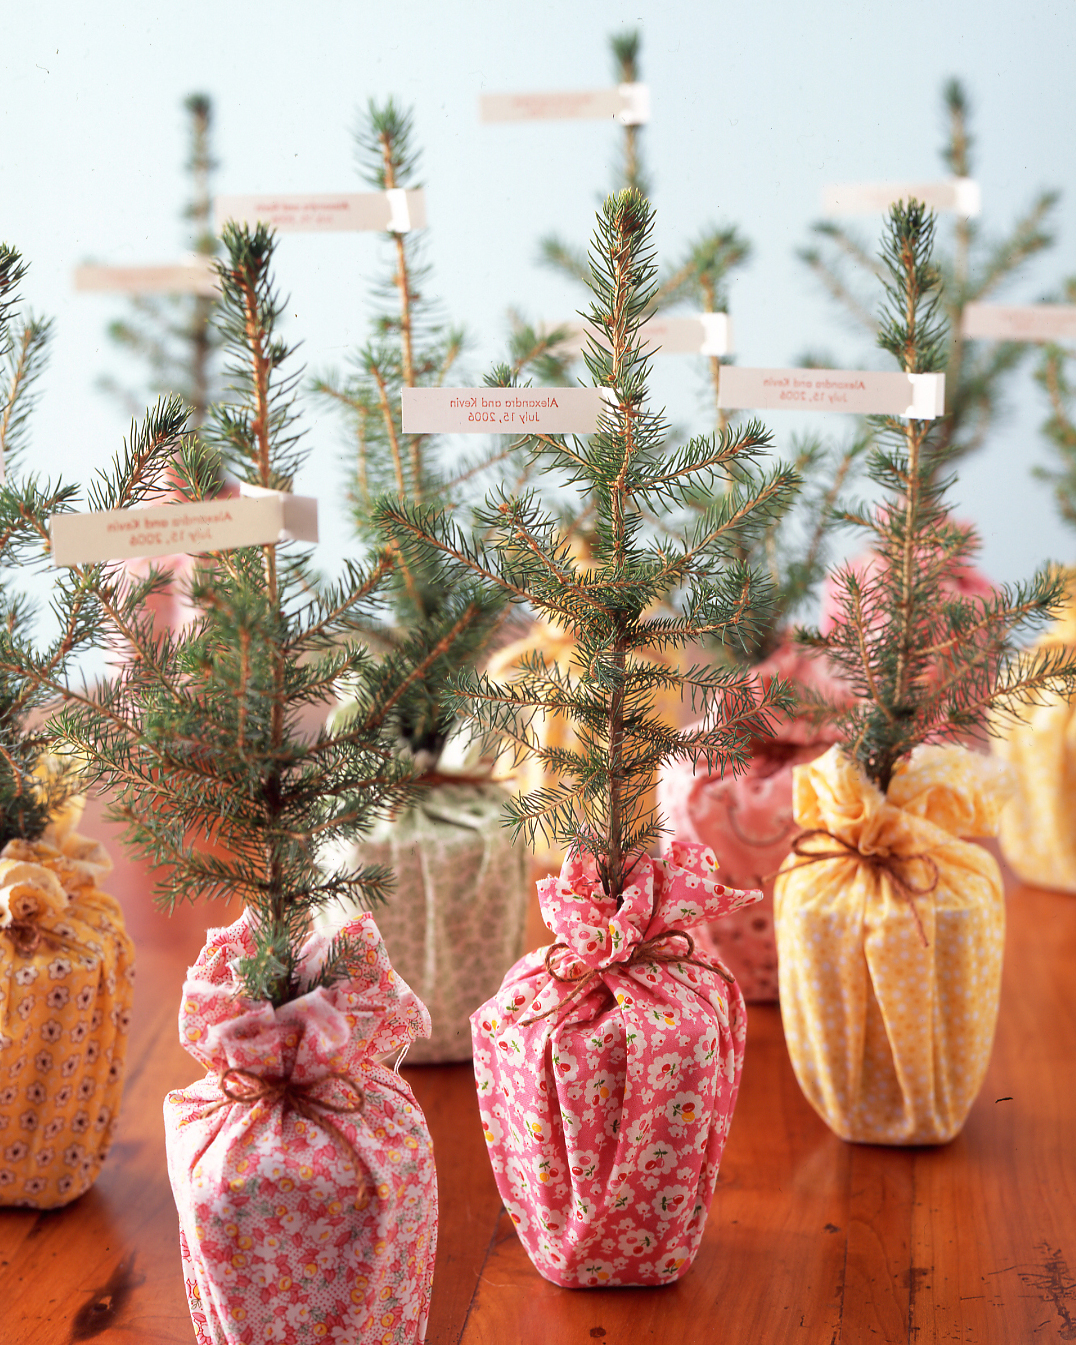 diy-winter-wedding-ideas-pinetree-favor-1114.jpg